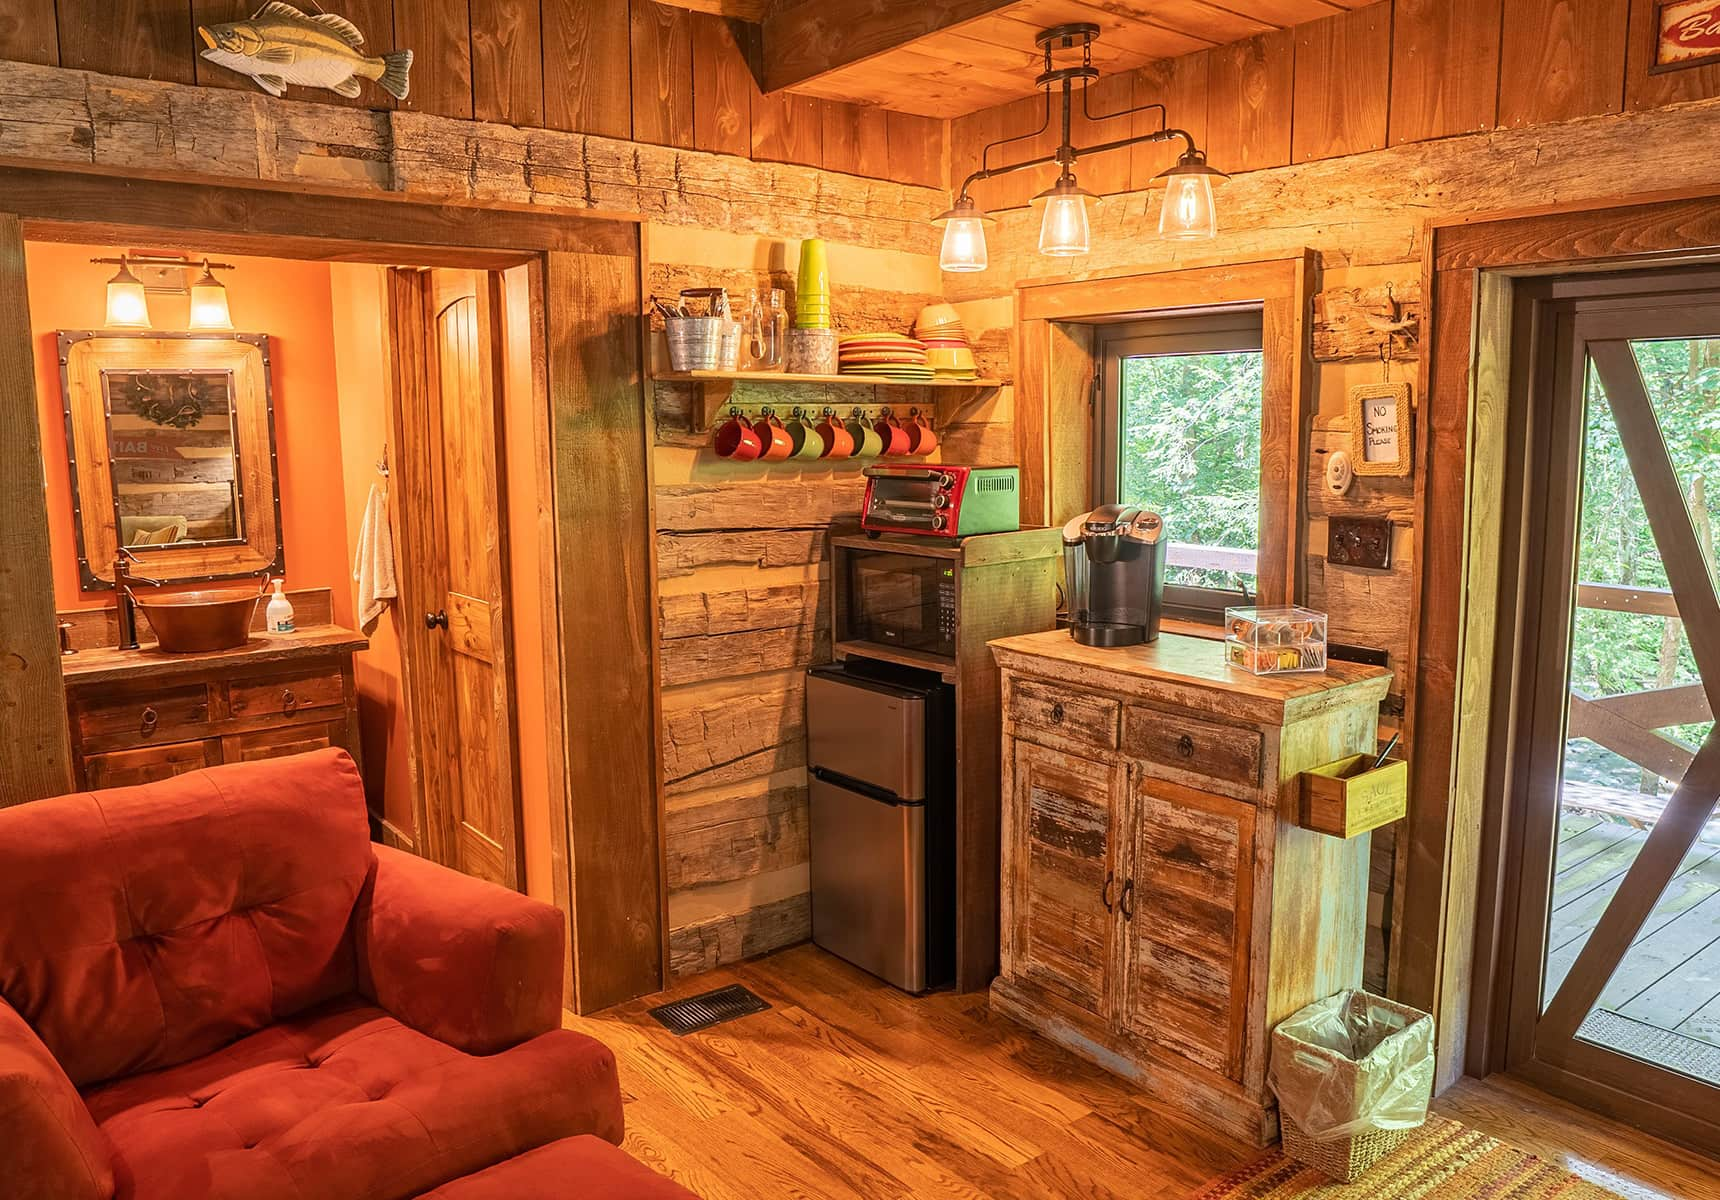 Fishing Creek Cabin kitchenette and amenities